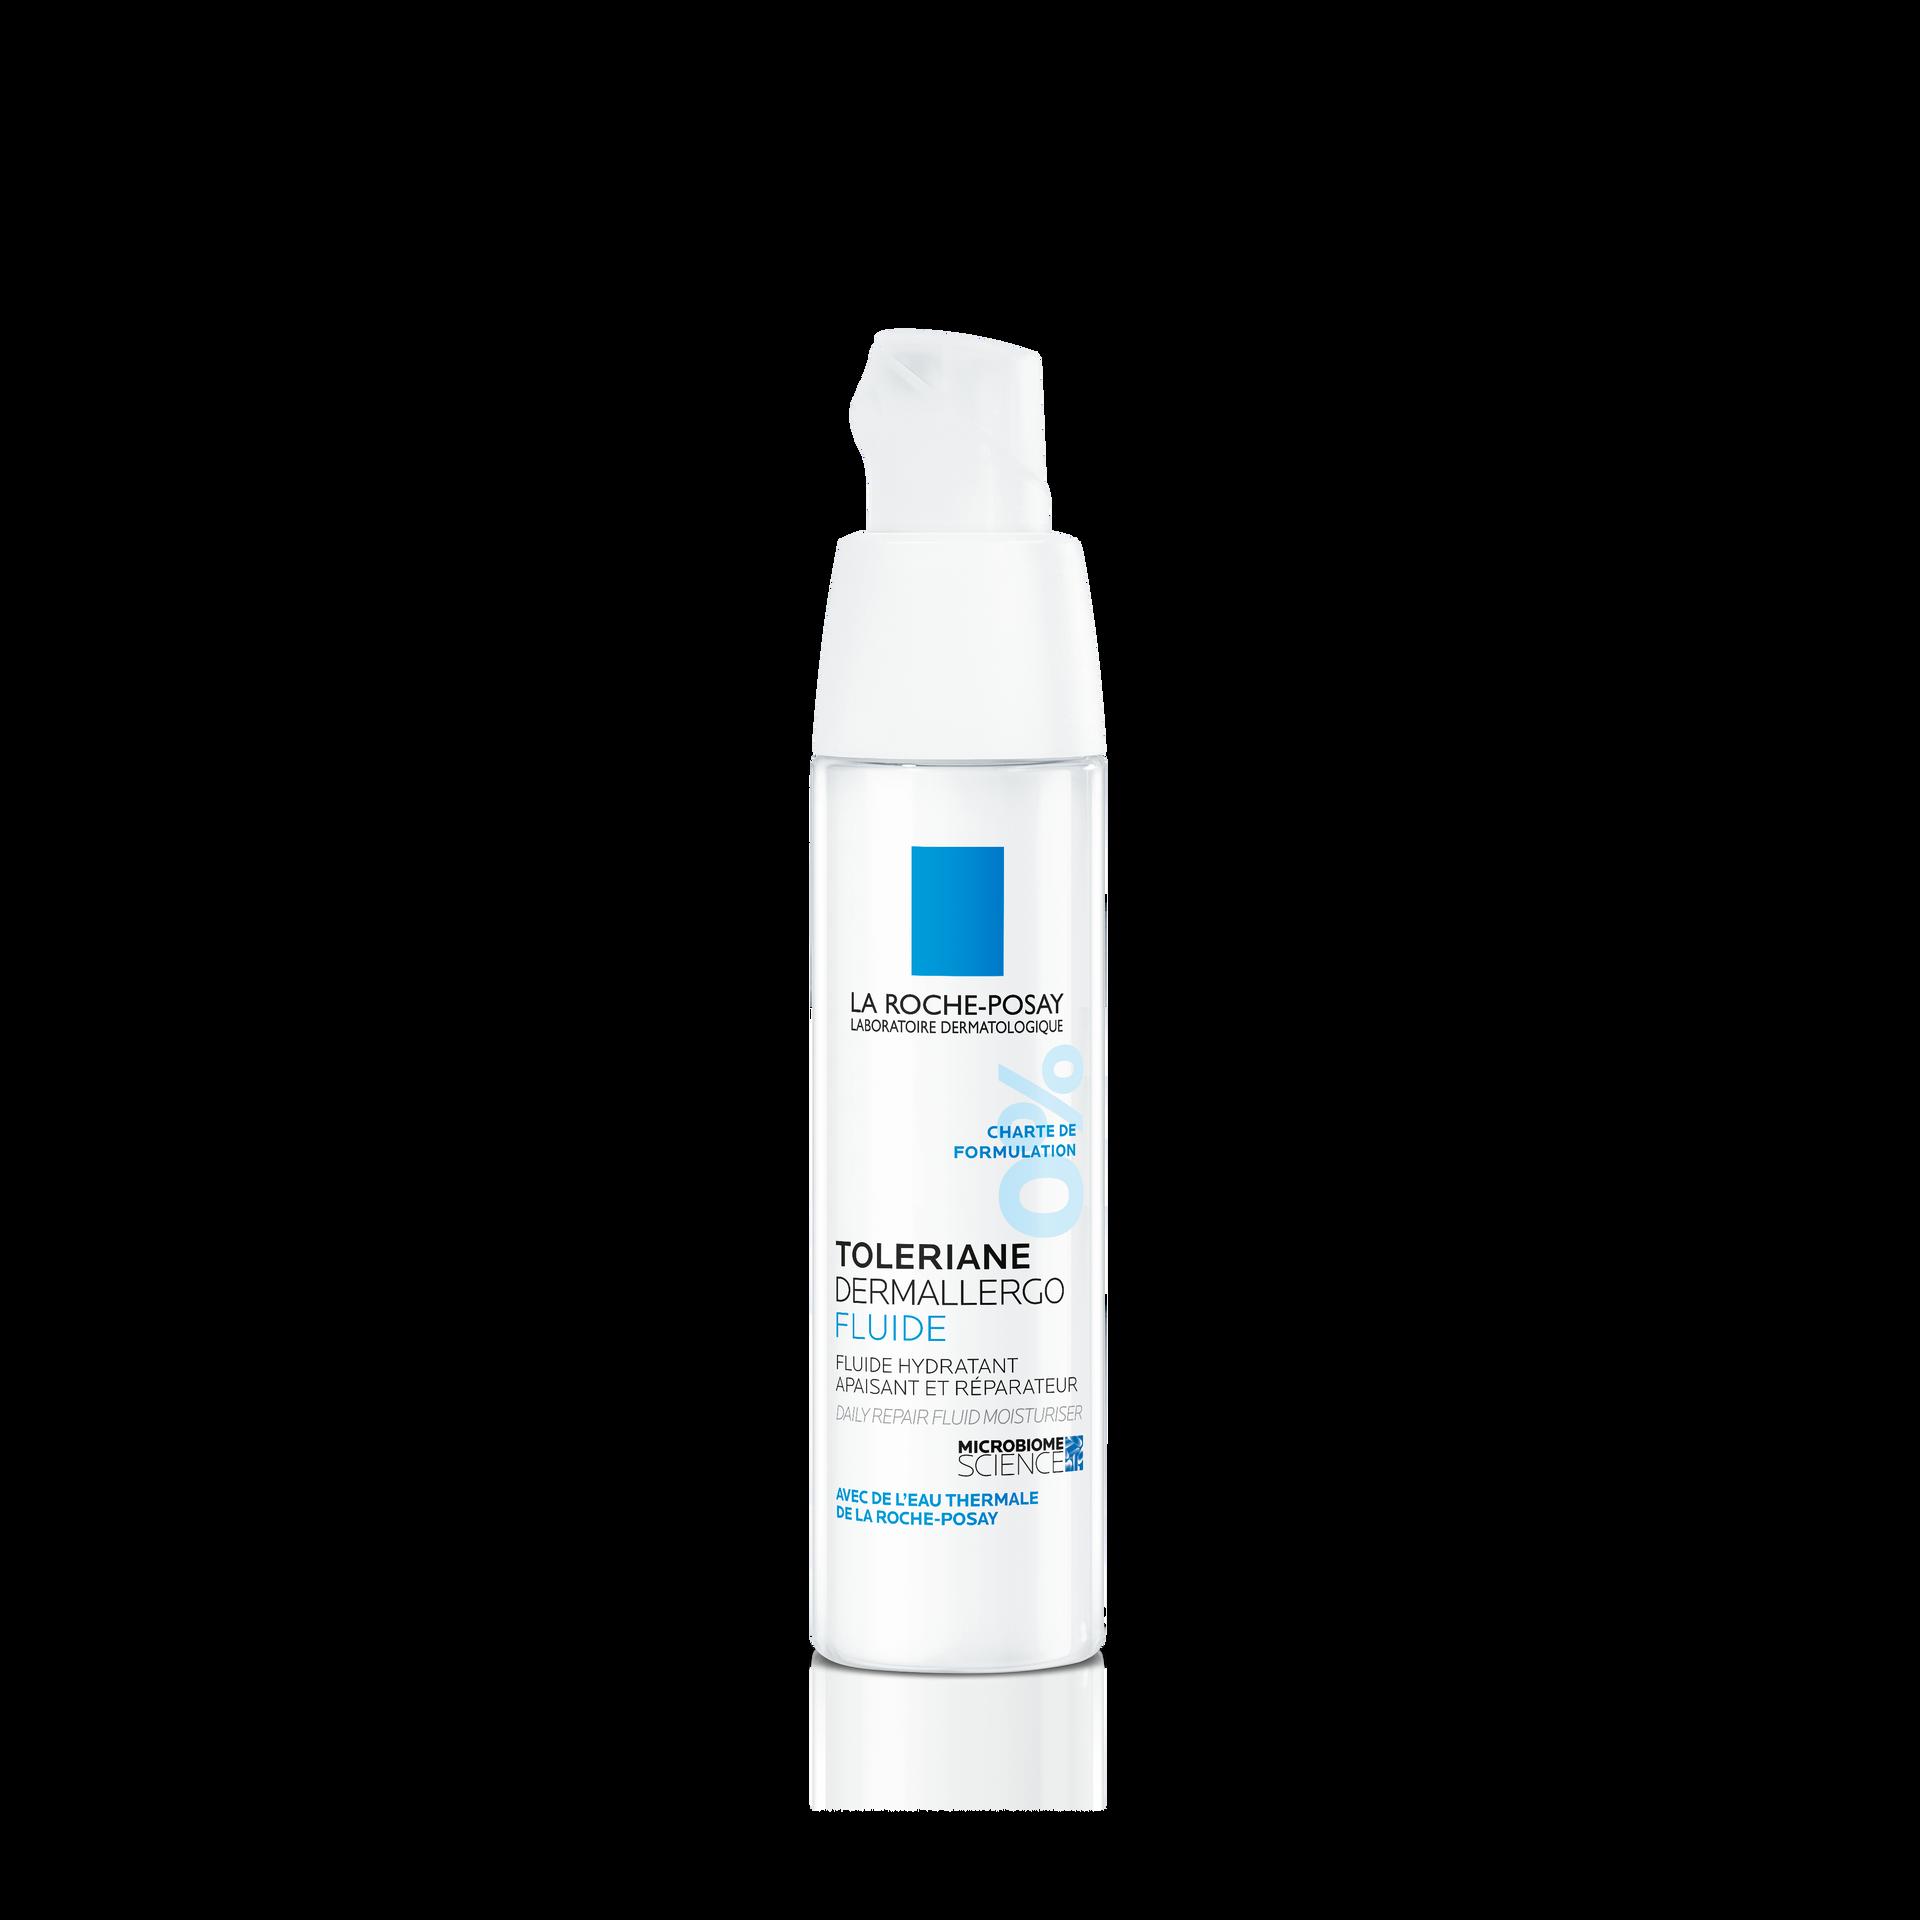 La Roche Posay ProductPage Sensitive Allergic Toleriane Dermallergo Fluide 4